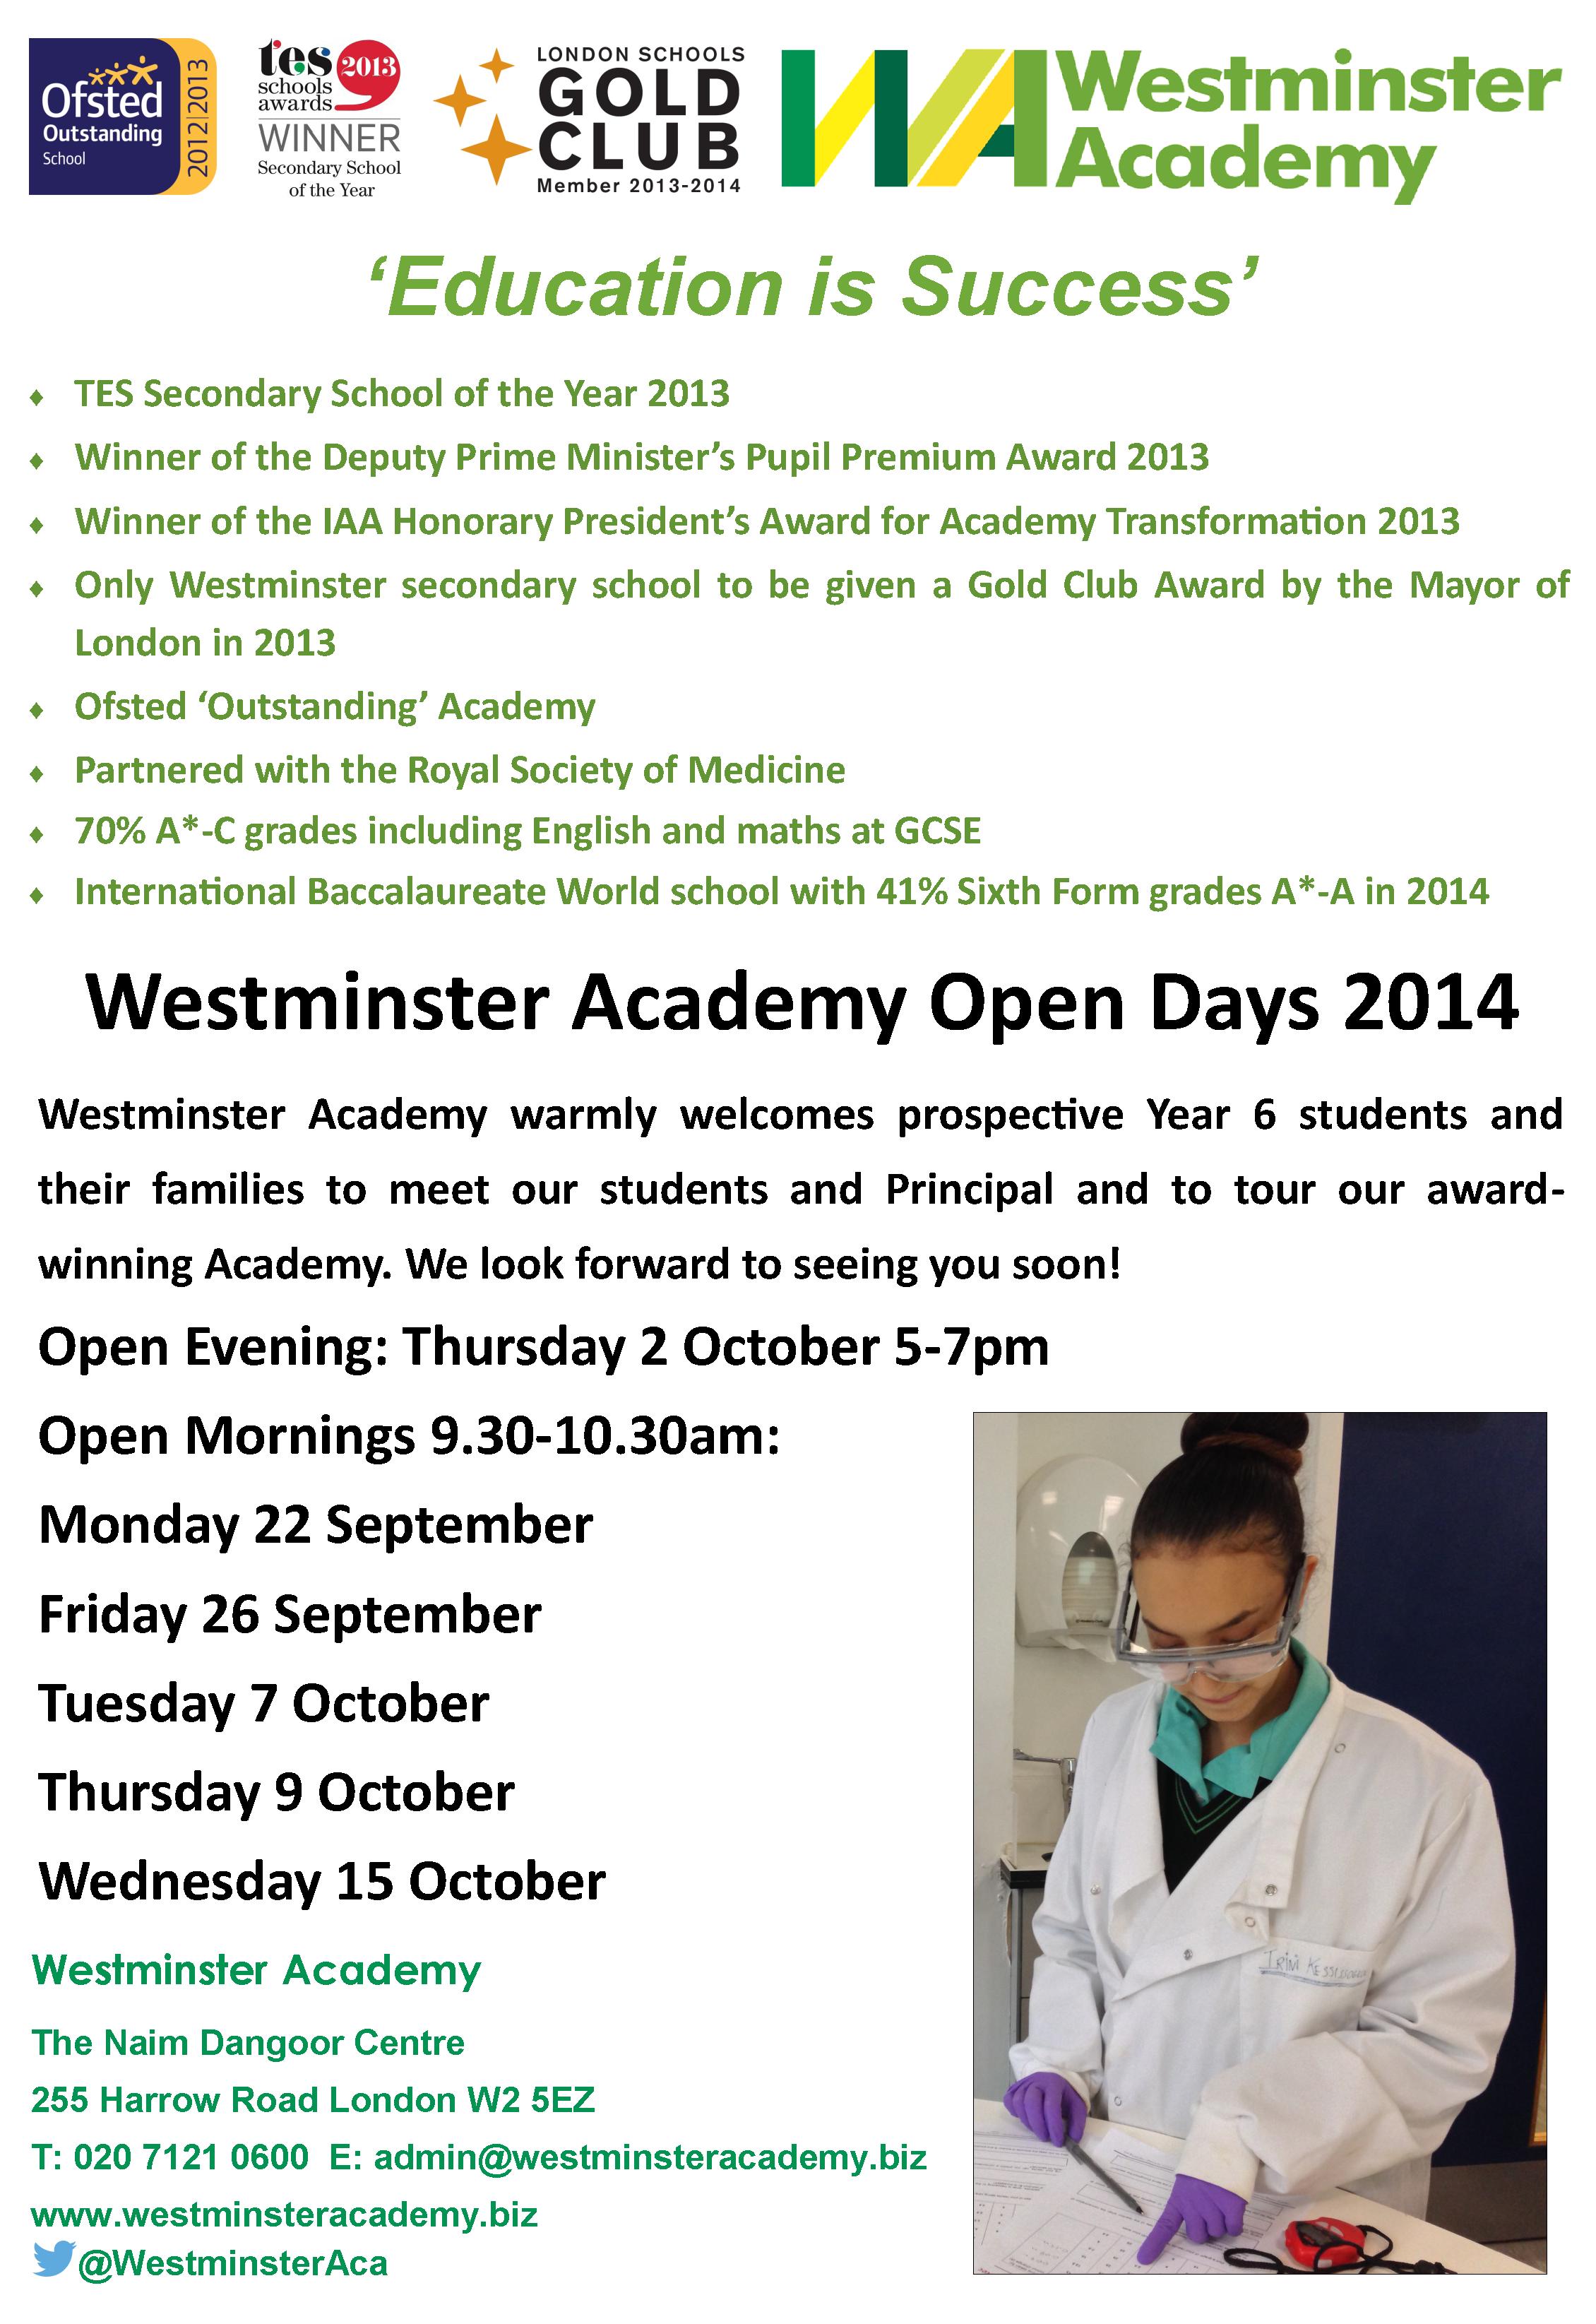 WA Open Days autumn 2014